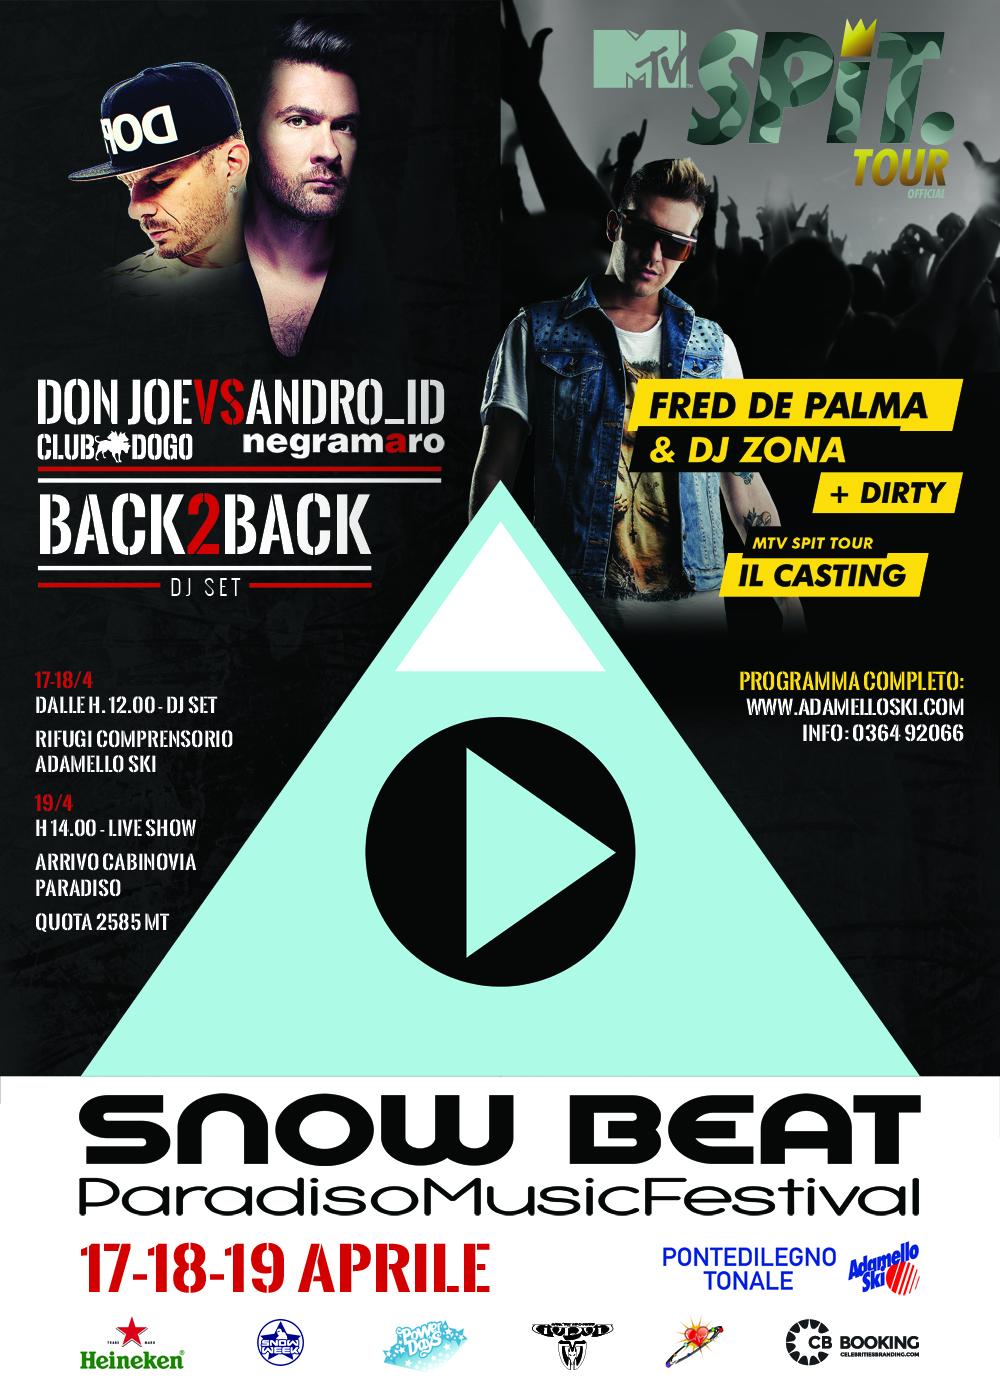 SNOW BEAT - PARADISO MUSIC FESTIVAL